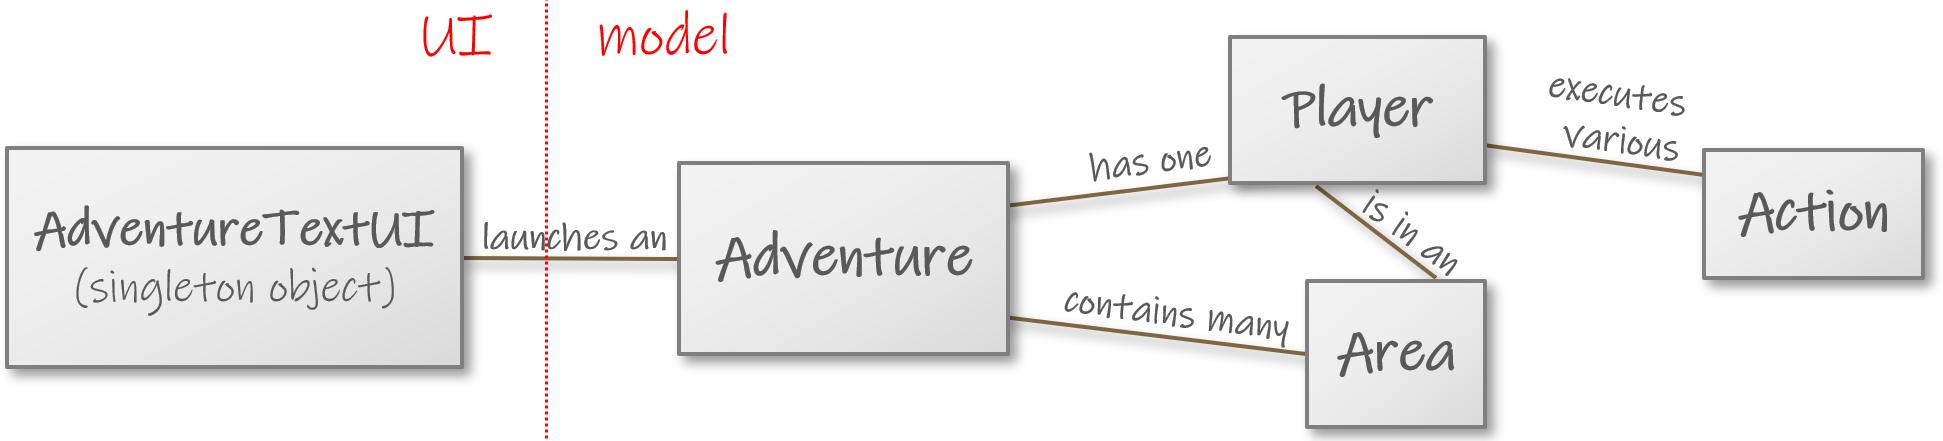 ../_images/module_adventuredraft.png